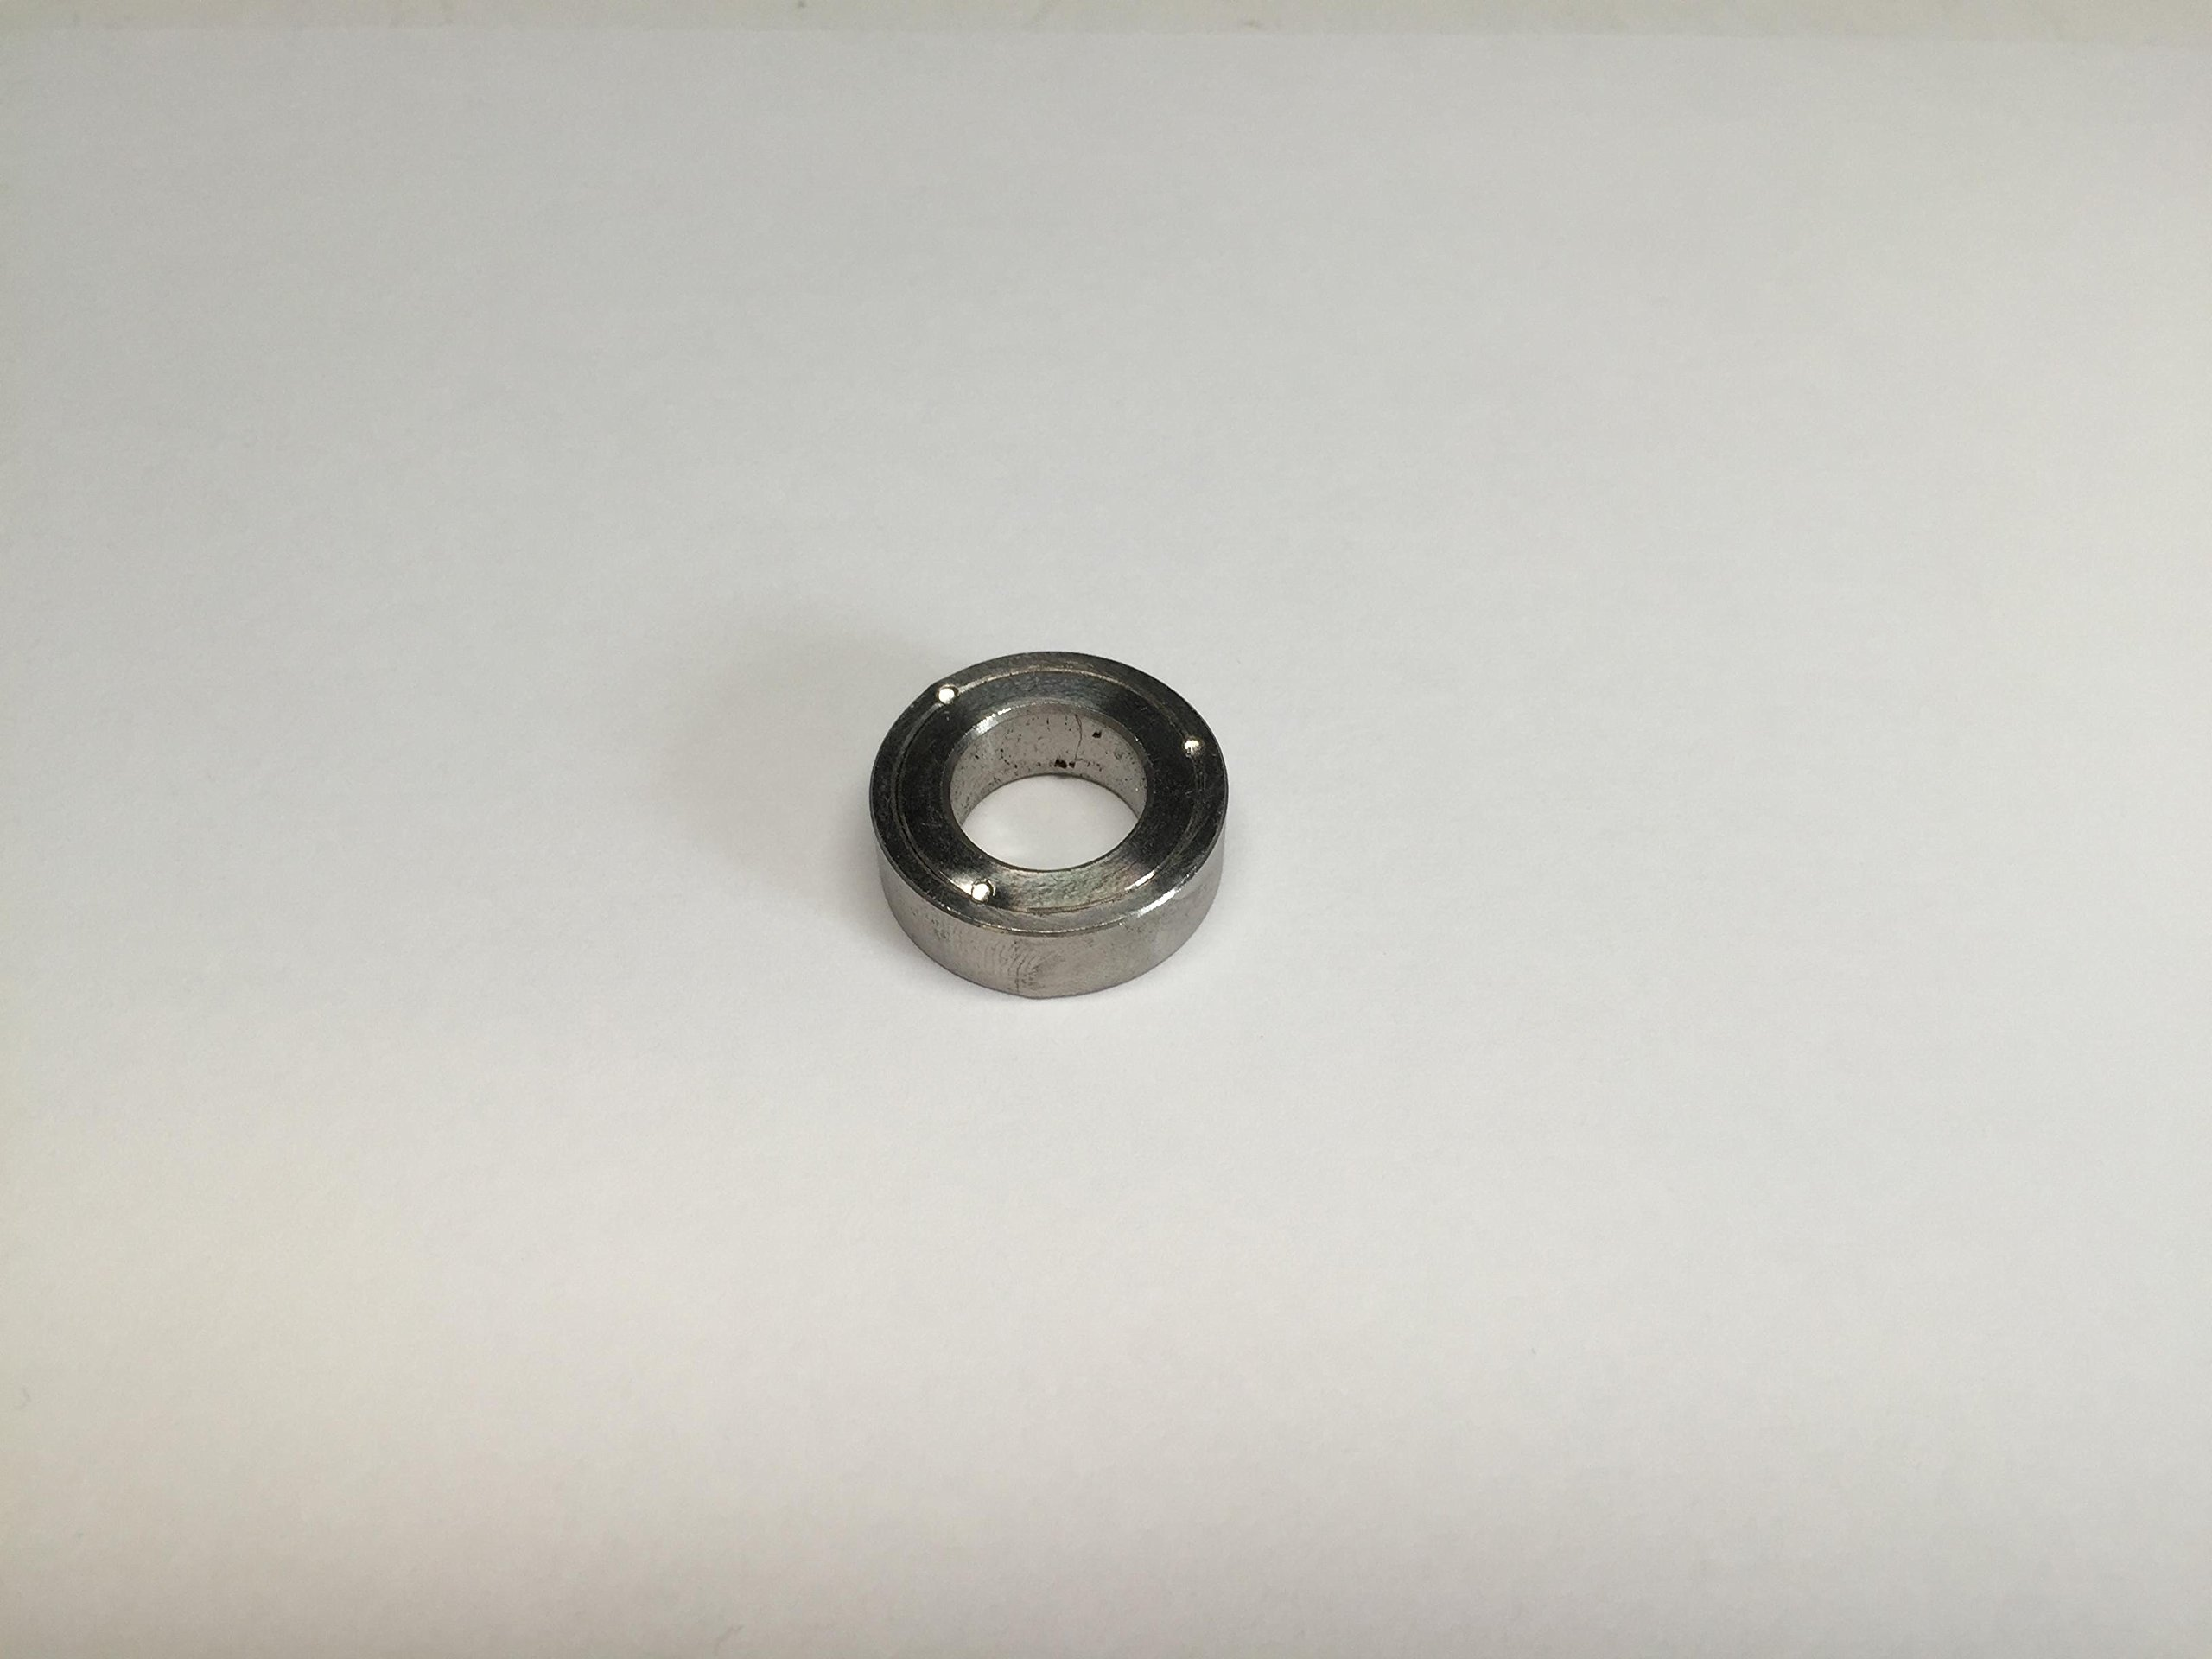 Ametek Gemco Magnet. Hydraulic Cylinder Magnet. 1 Inch Diameter: SD0410300